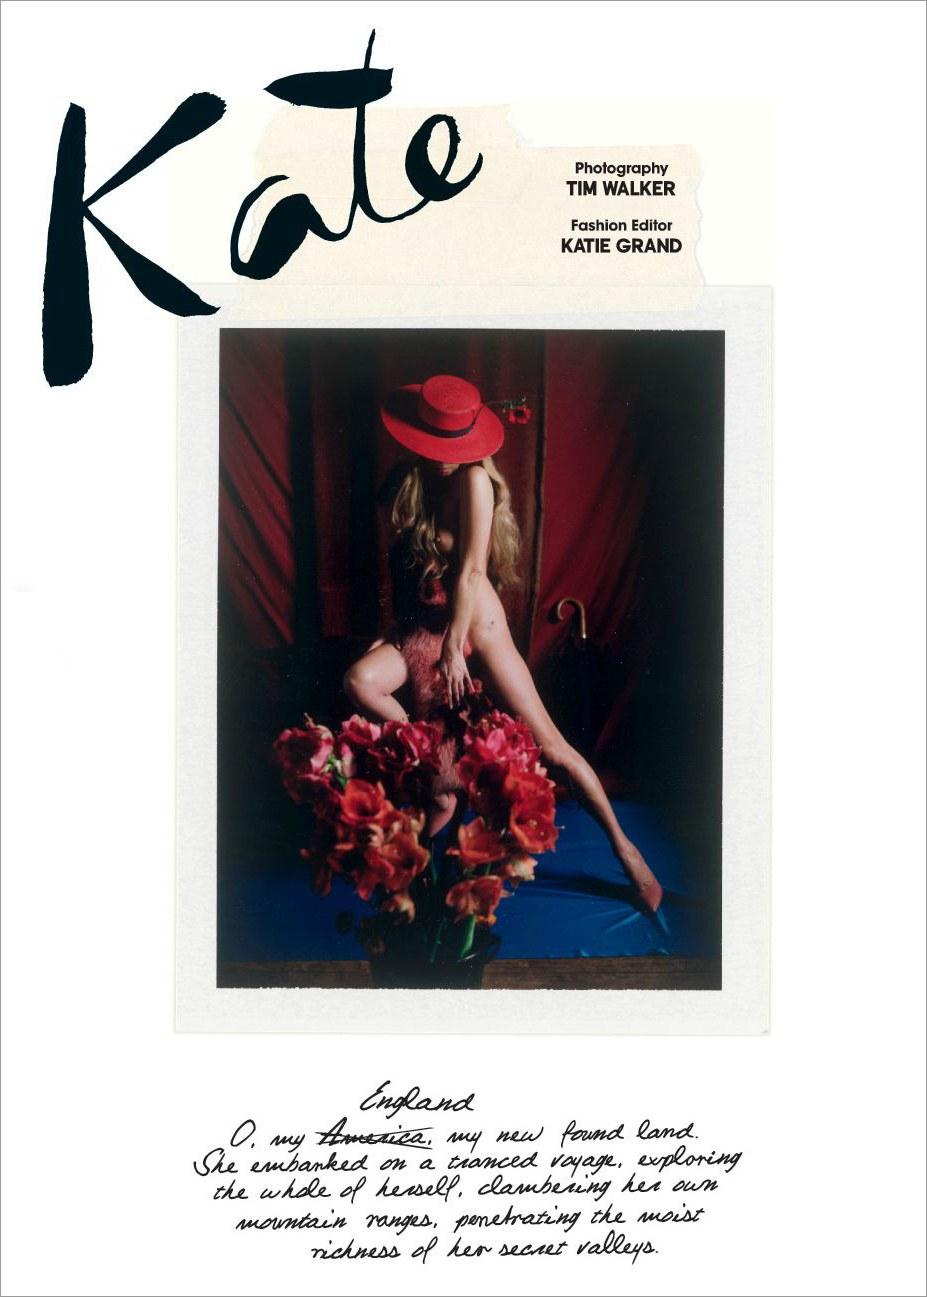 Kate Moss / Кейт Мосс в одежде из цветов в журнале Love Magazine, весна-лето 2013 / фотограф Tim Walker